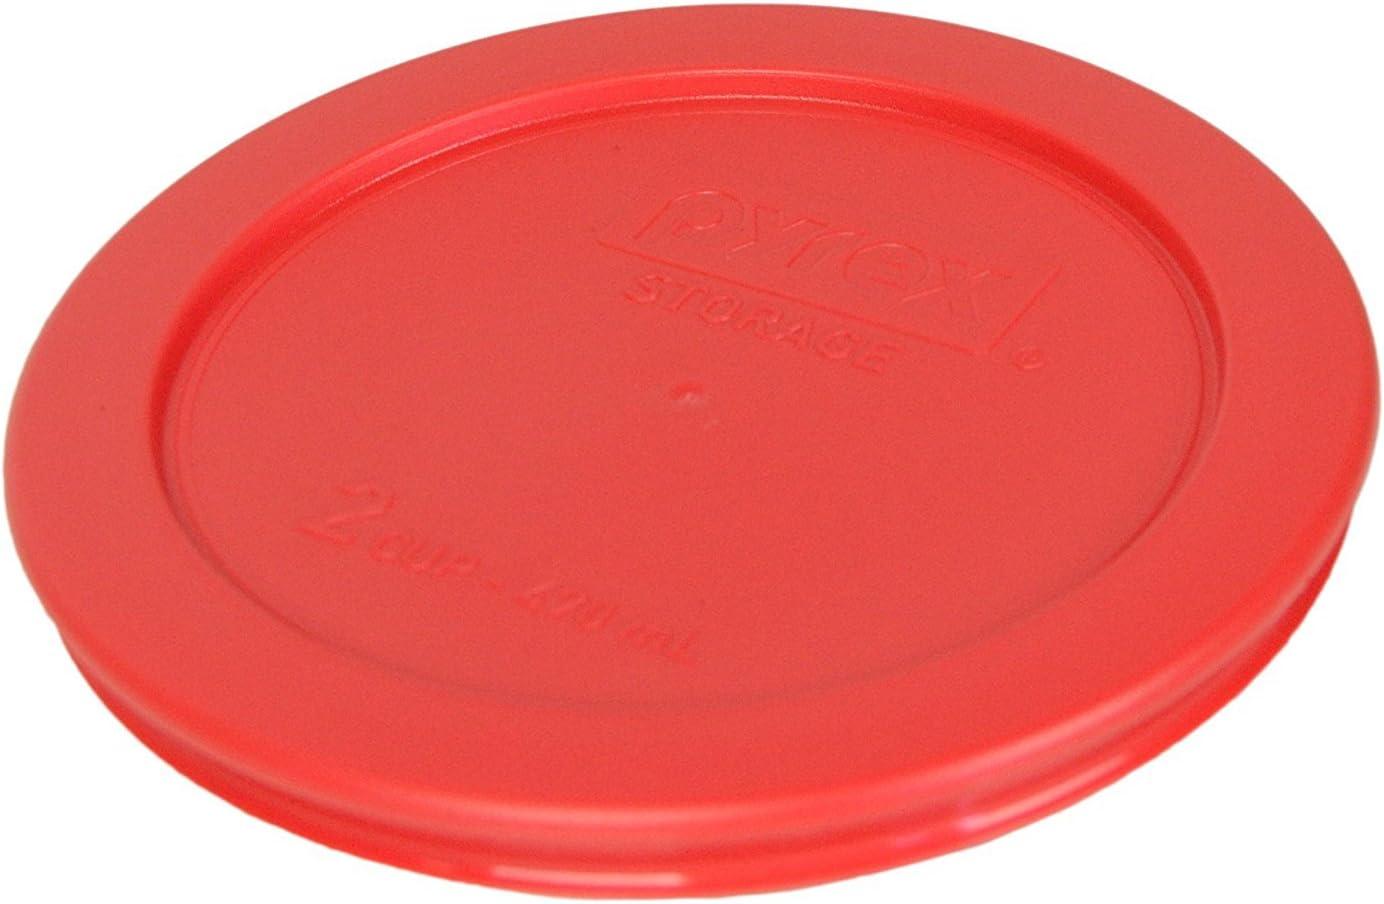 4, Orange Pyrex 7200-PC Round 2 Cup Storage Lid for Glass Bowls 1, Orange